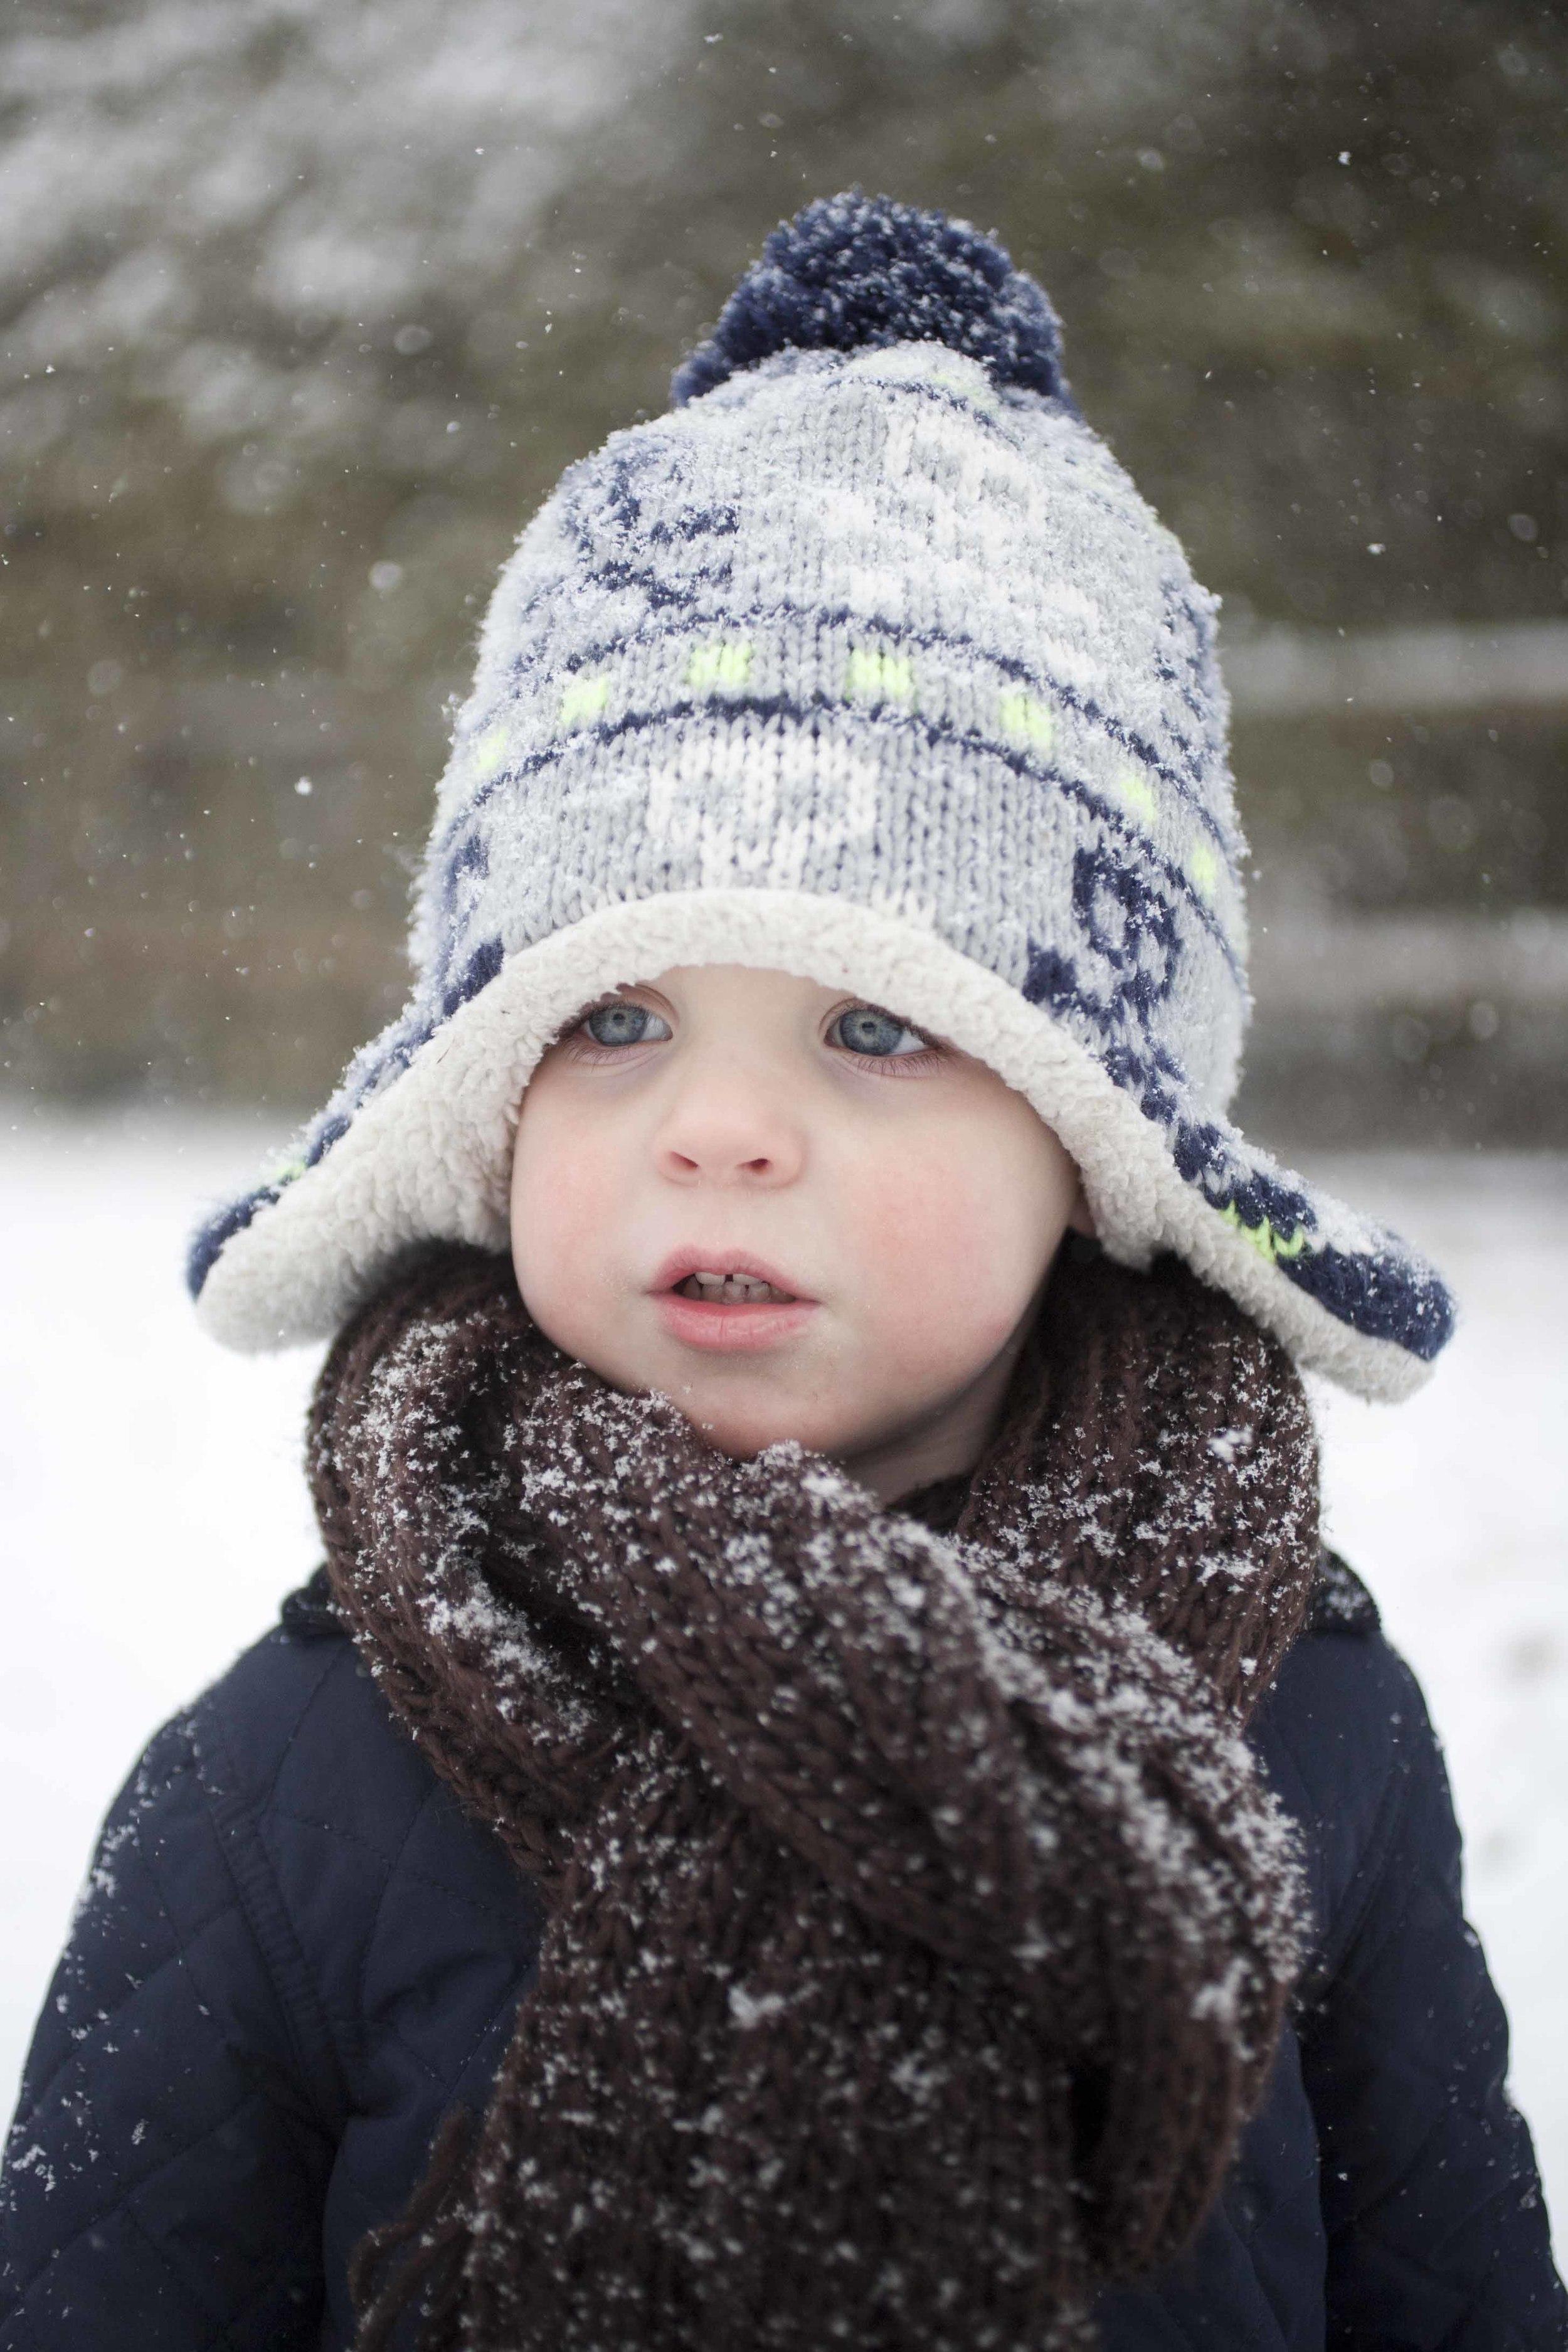 SNOW DAY ARIANA CLARE_2.jpg